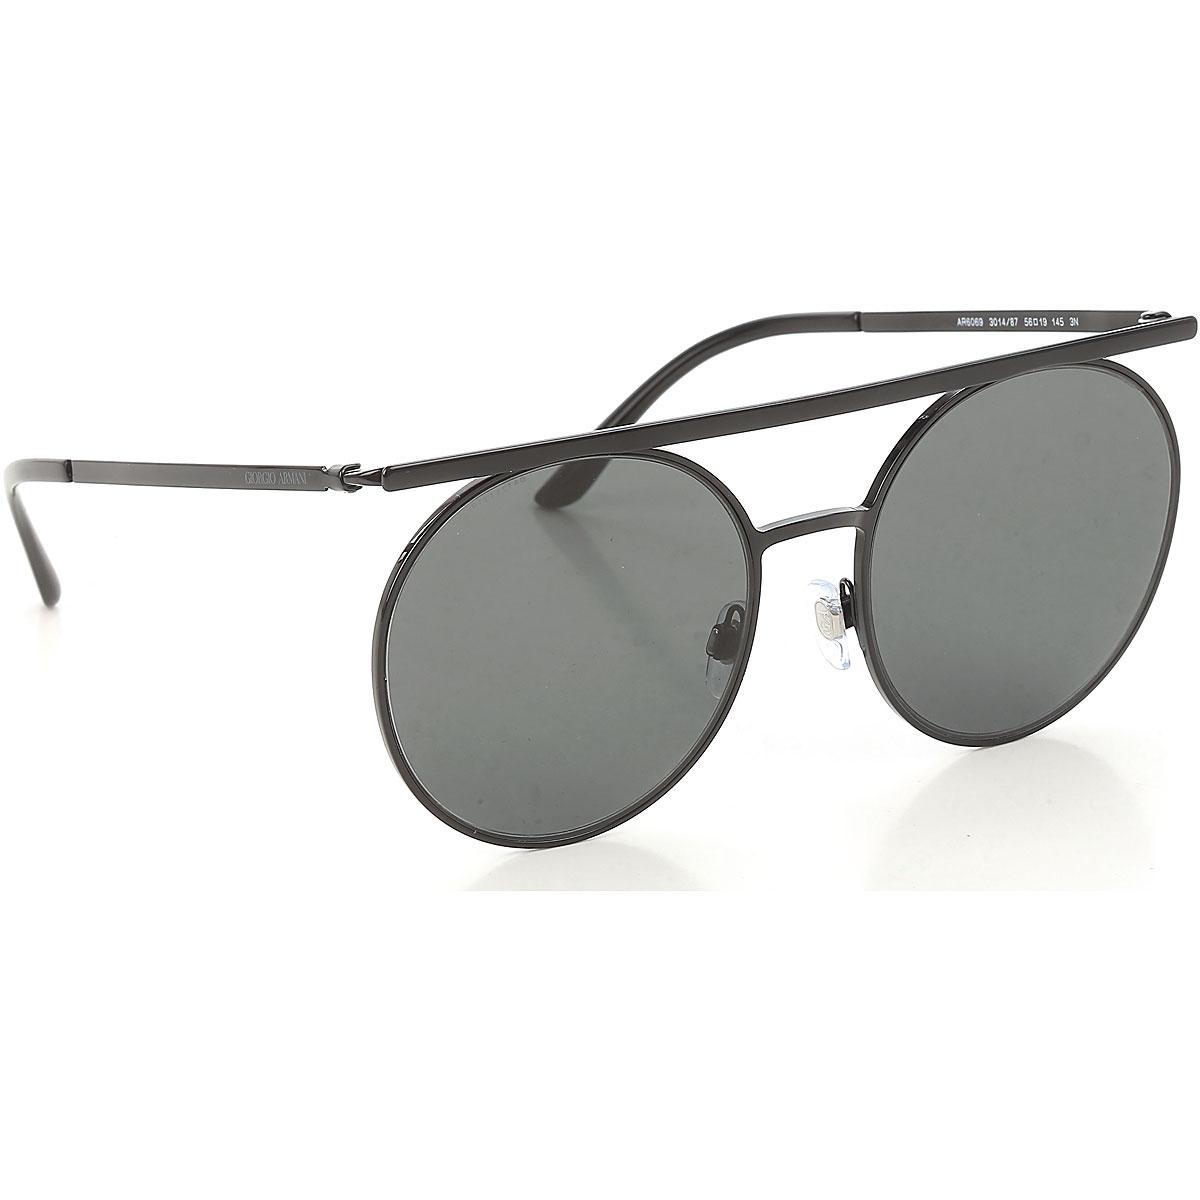 Giorgio Armani Sunglasses On Sale, Black, 2019